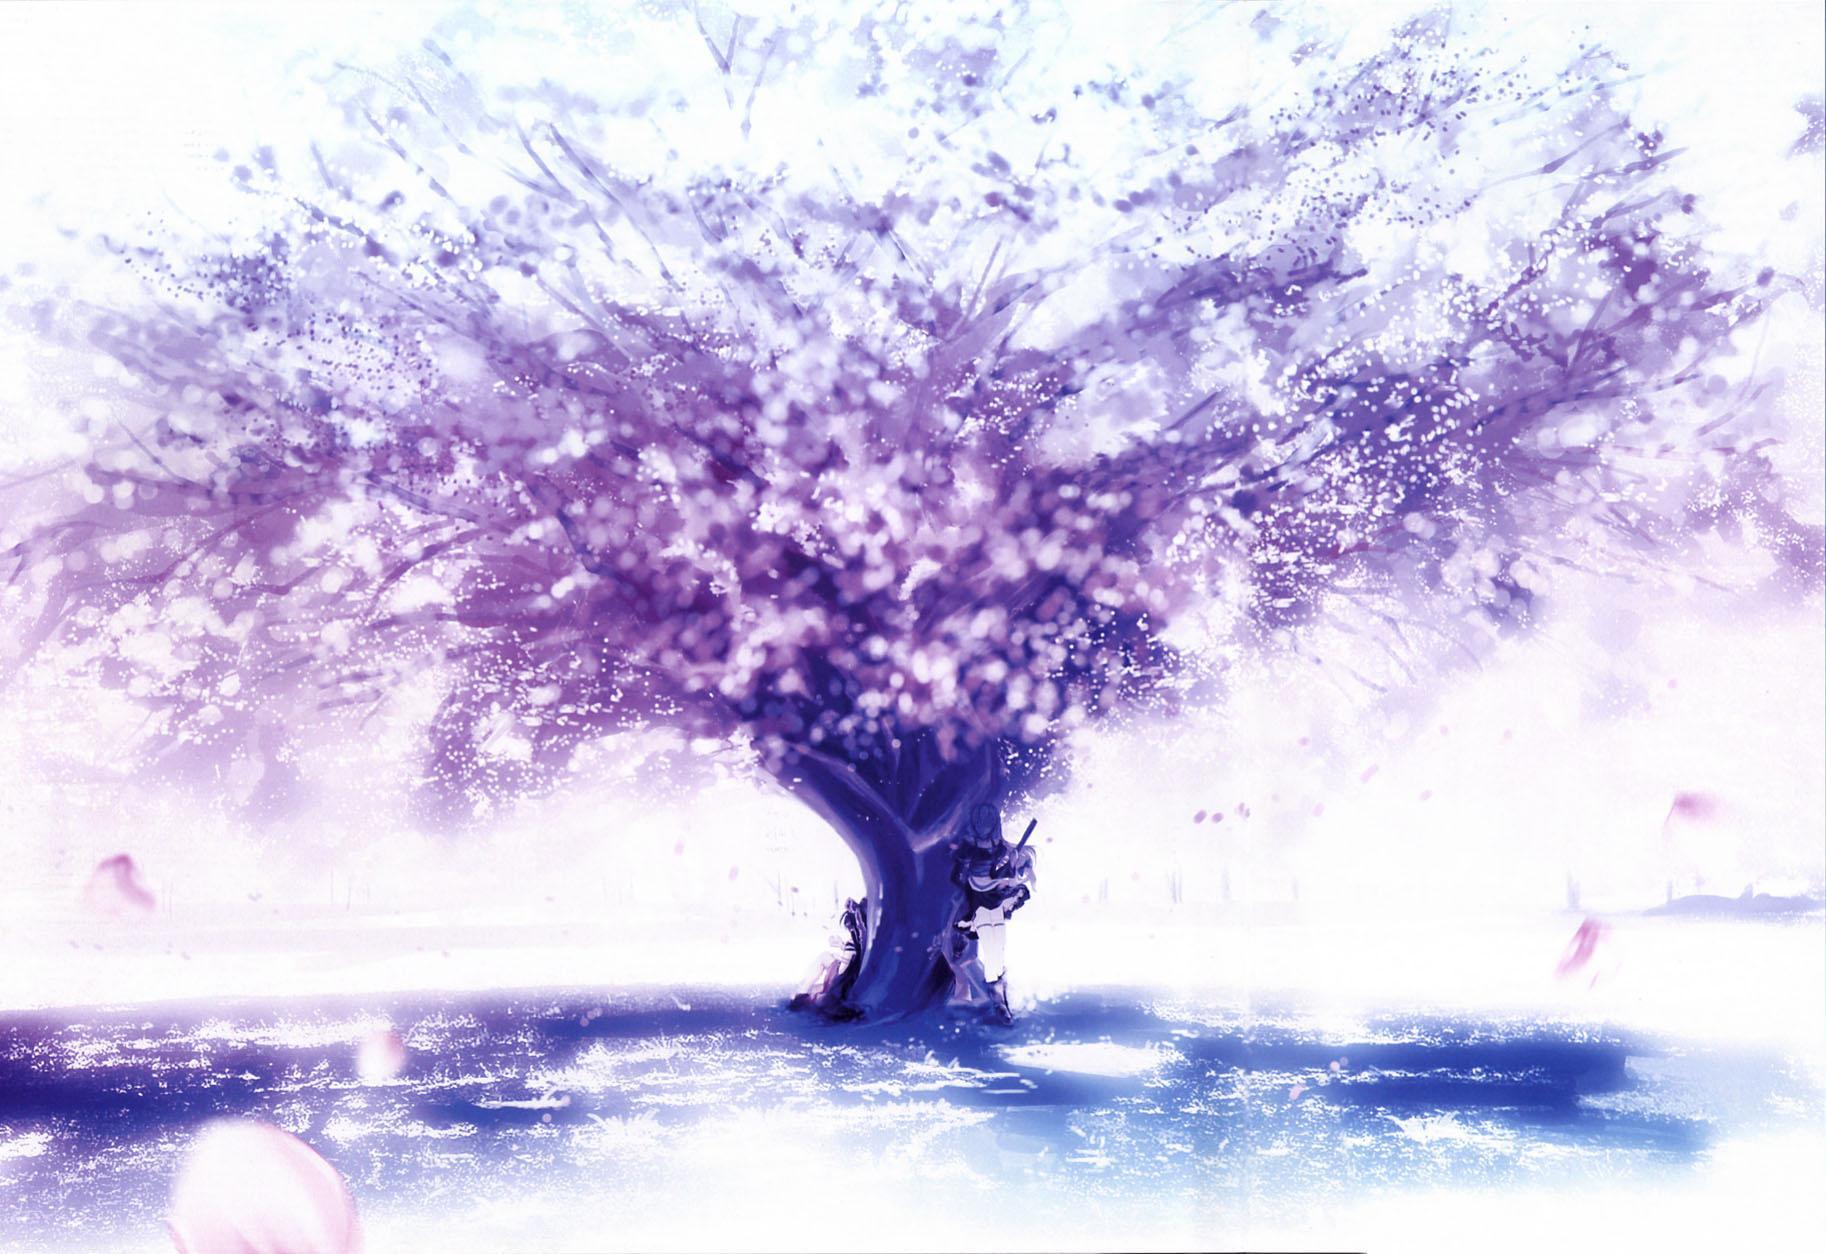 Reimu Hakurei Marisa Kirisame Touhou Purple Tree Sakura 1826x1254